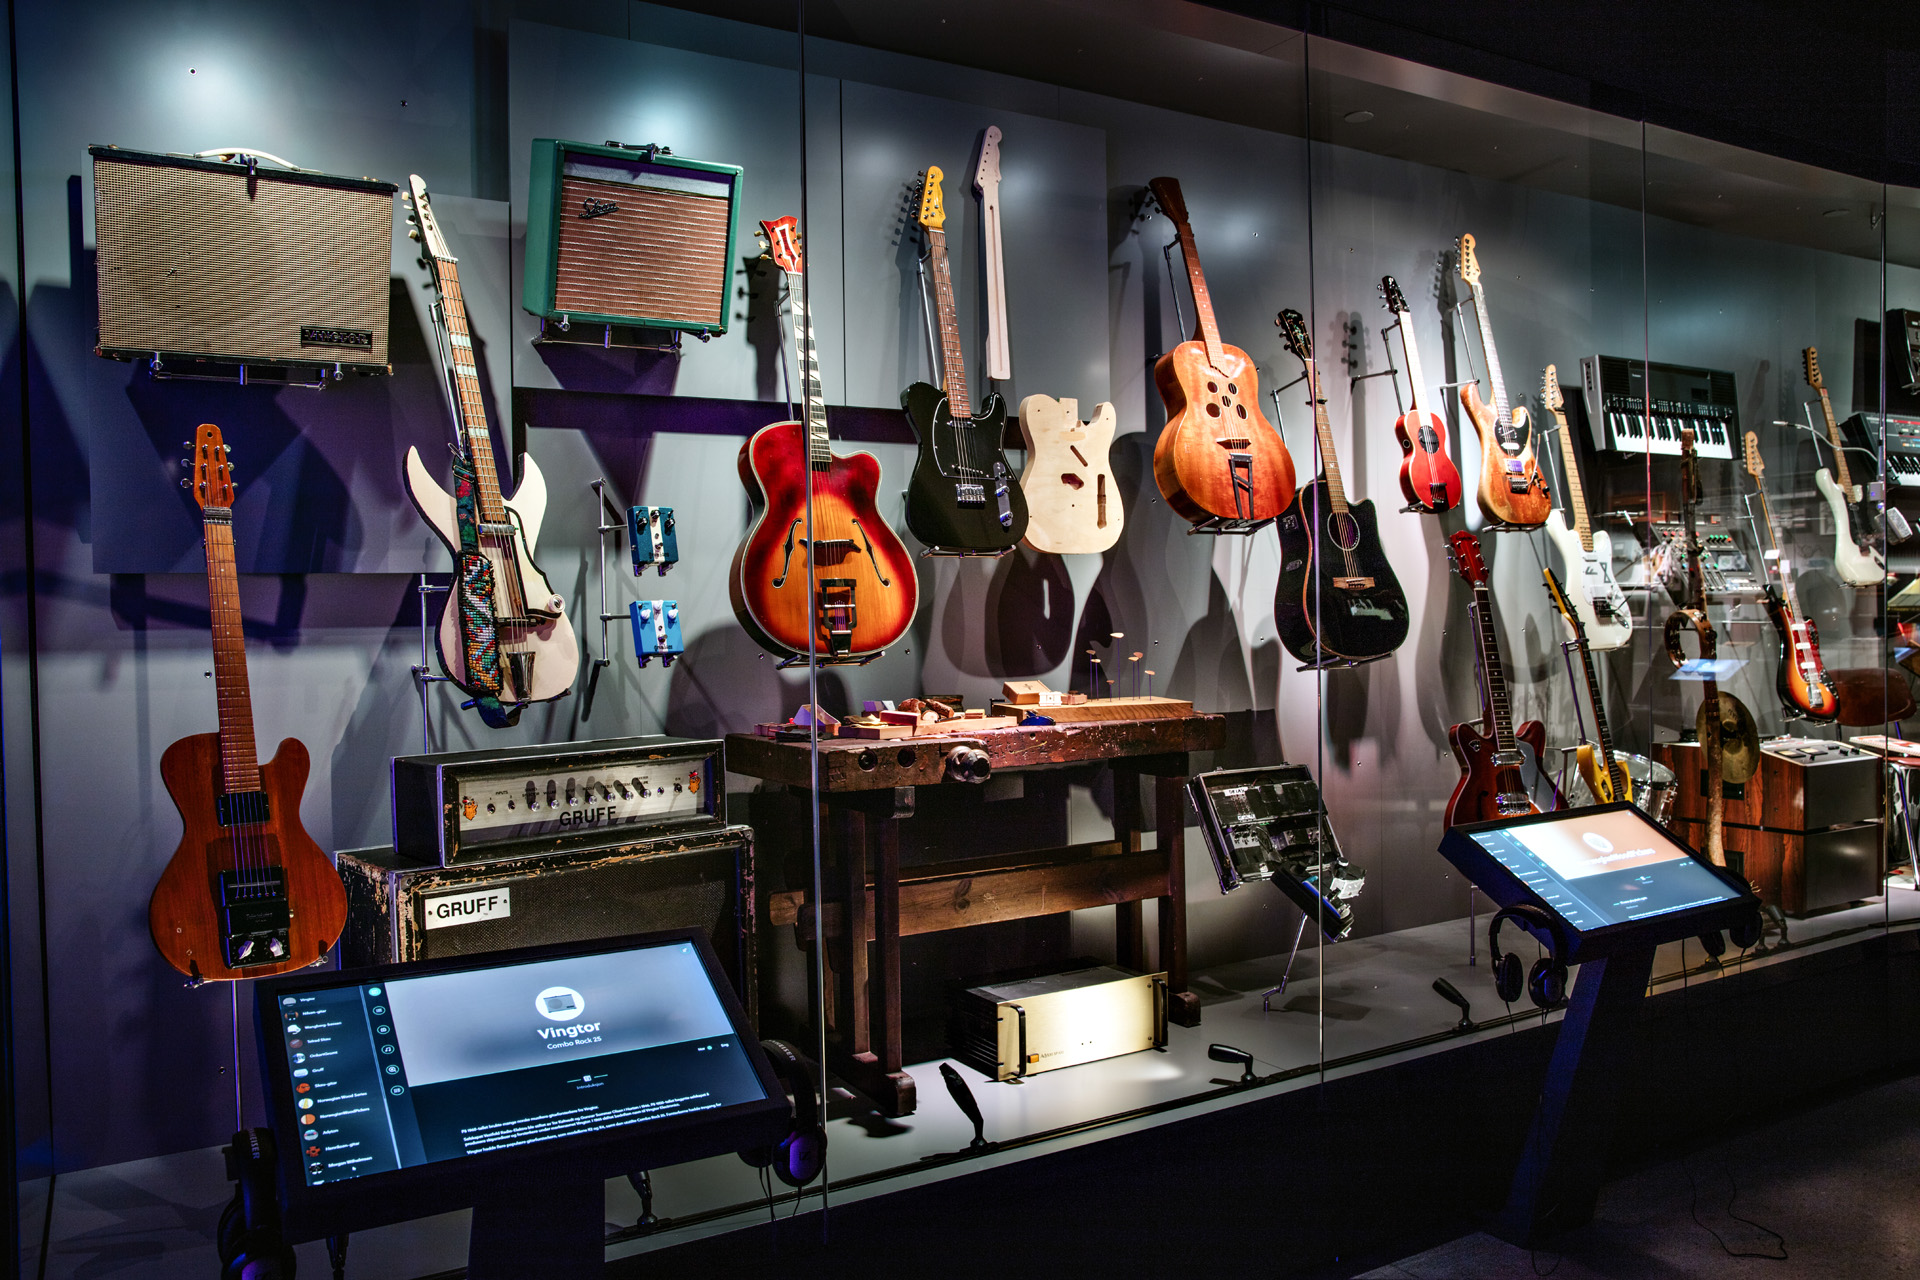 Rockheim Museum of Popular Music